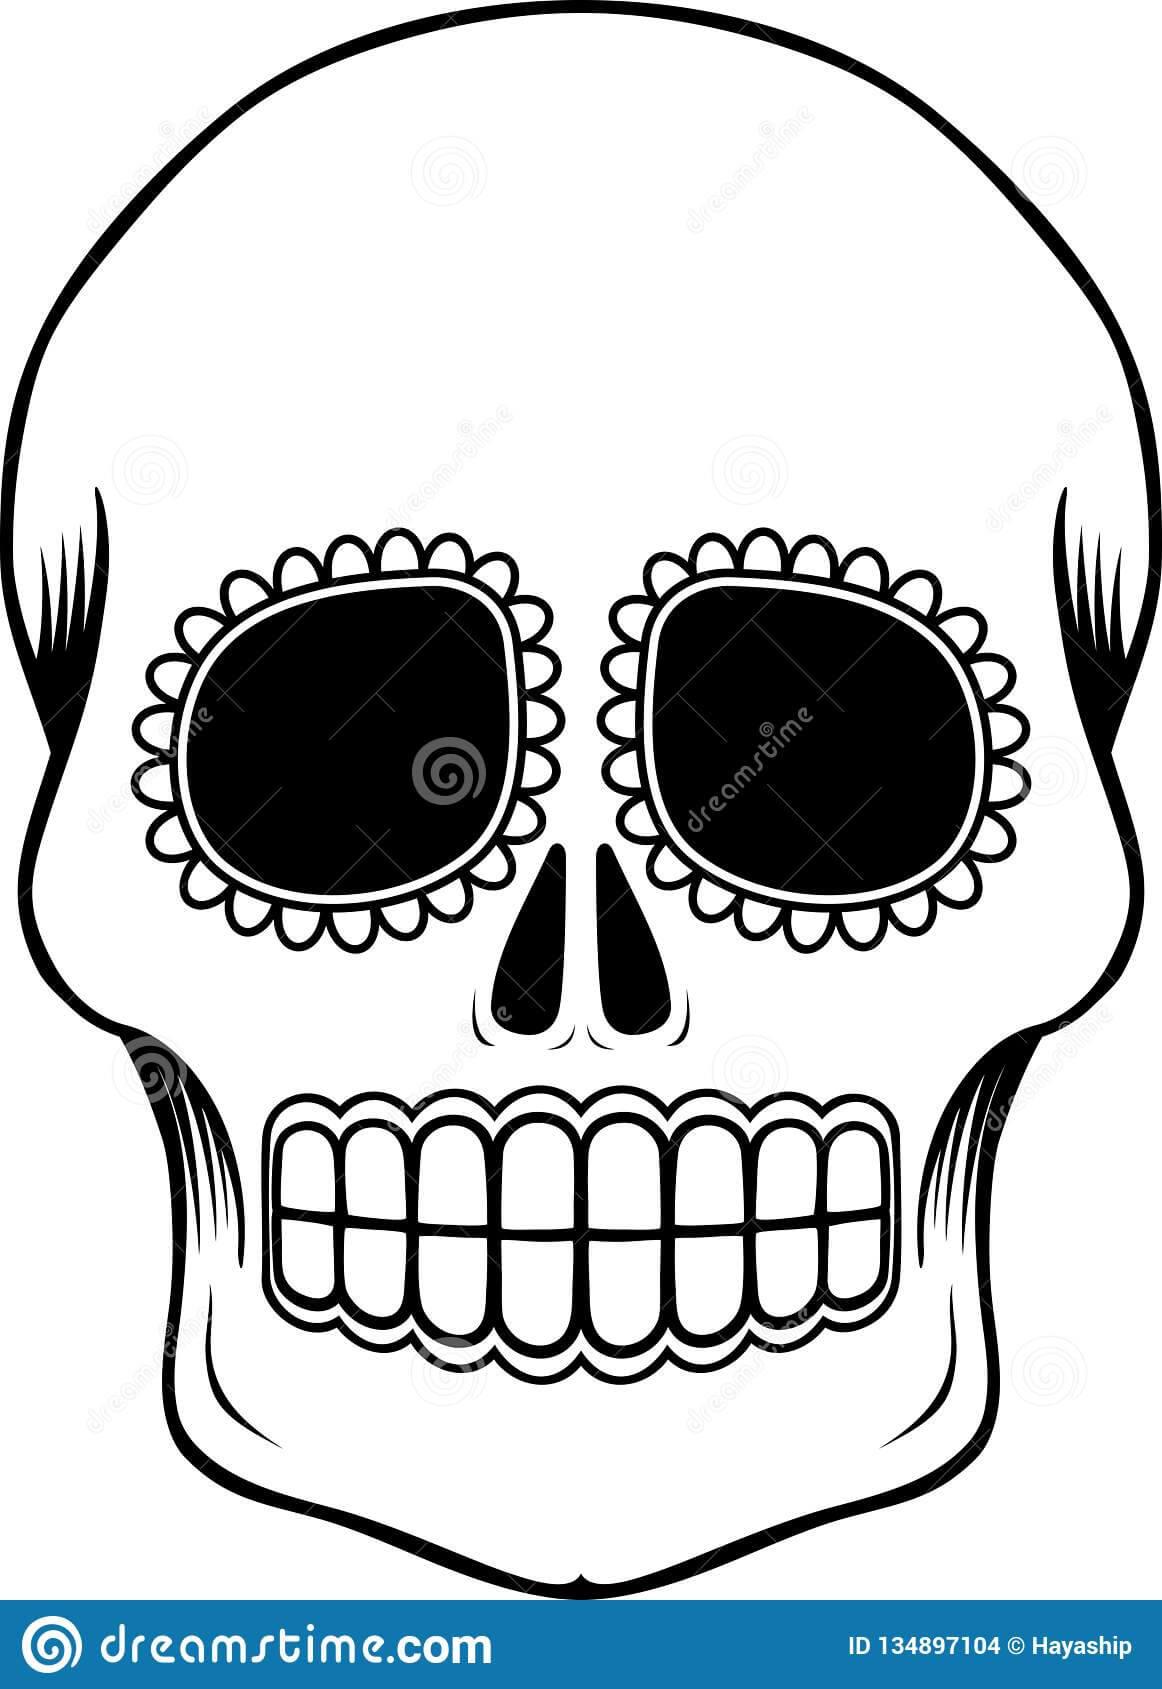 Mexican Sugar Skull Template Stock Vector - Illustration Of Pertaining To Blank Sugar Skull Template